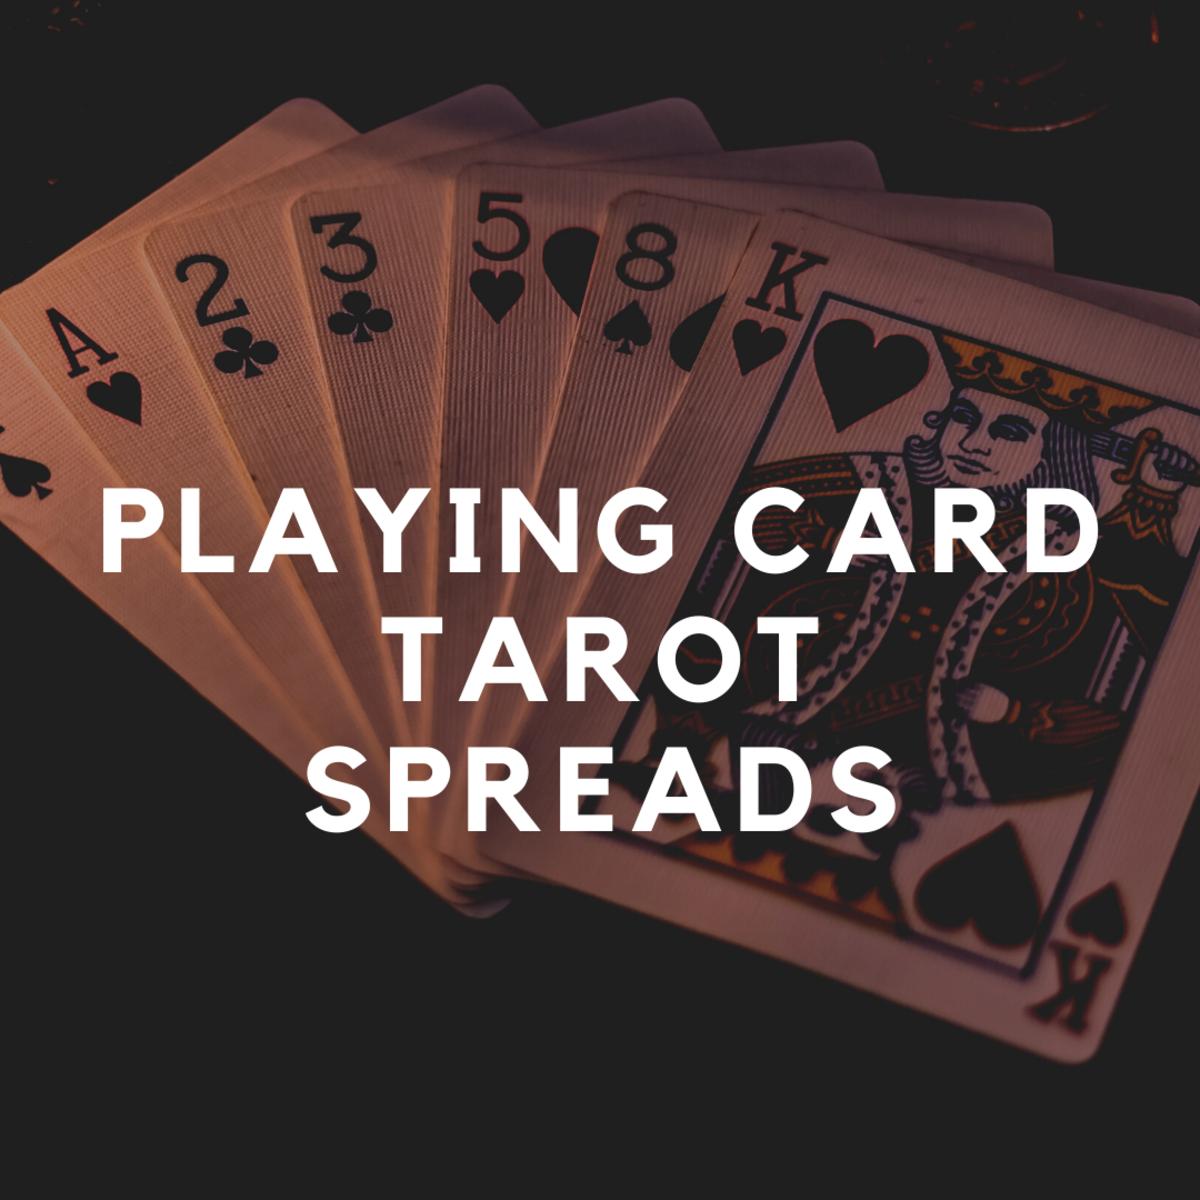 Playing Card Tarot Spreads